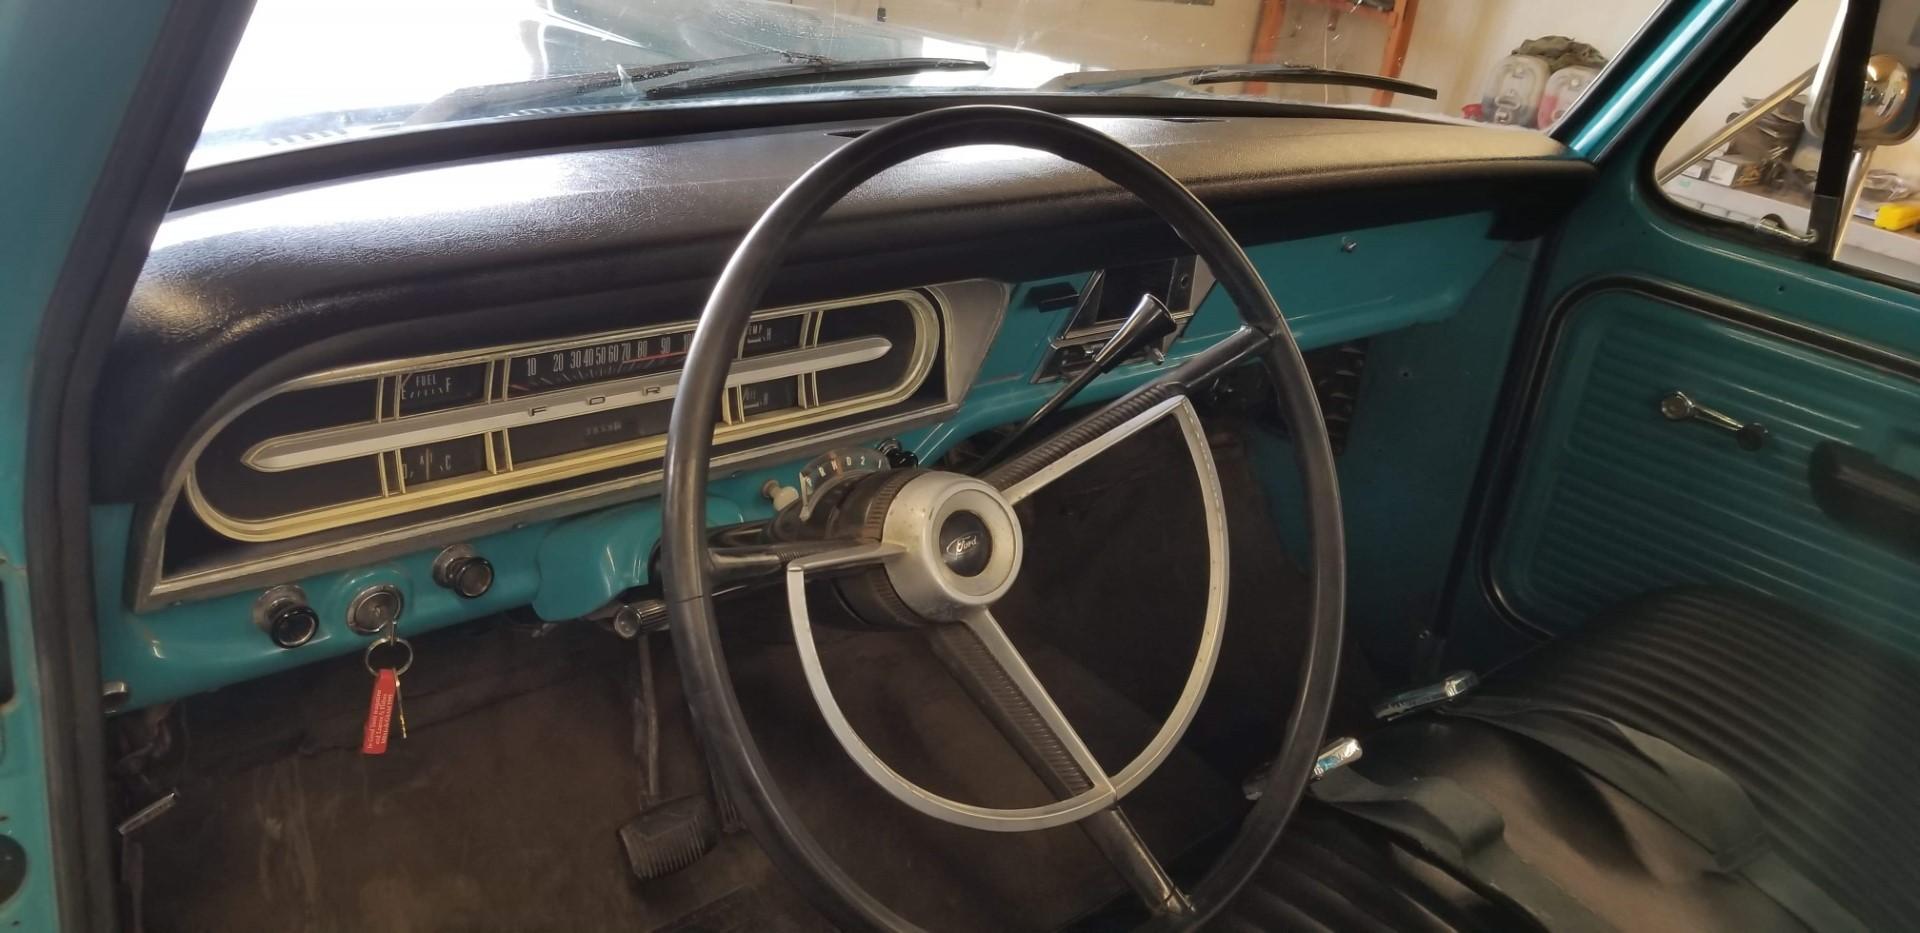 1969-Ford-F250-Custom-Cab-Camper-Special-360ci-V8-17